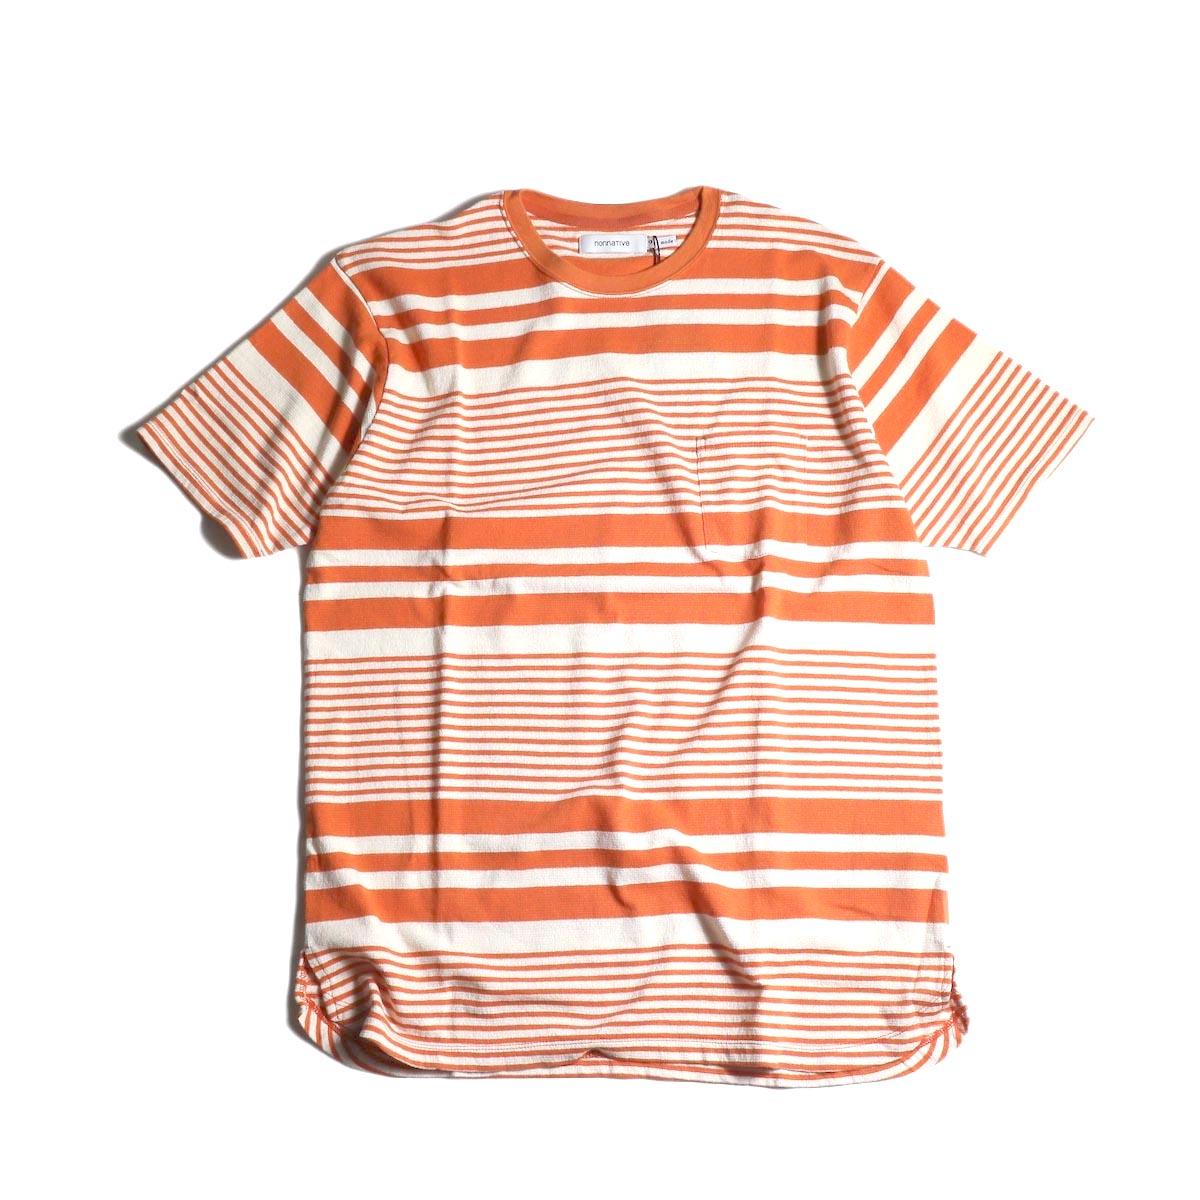 nonnative / DWELLER S/S TEE COTTON JERSEY BORDER (Orange)